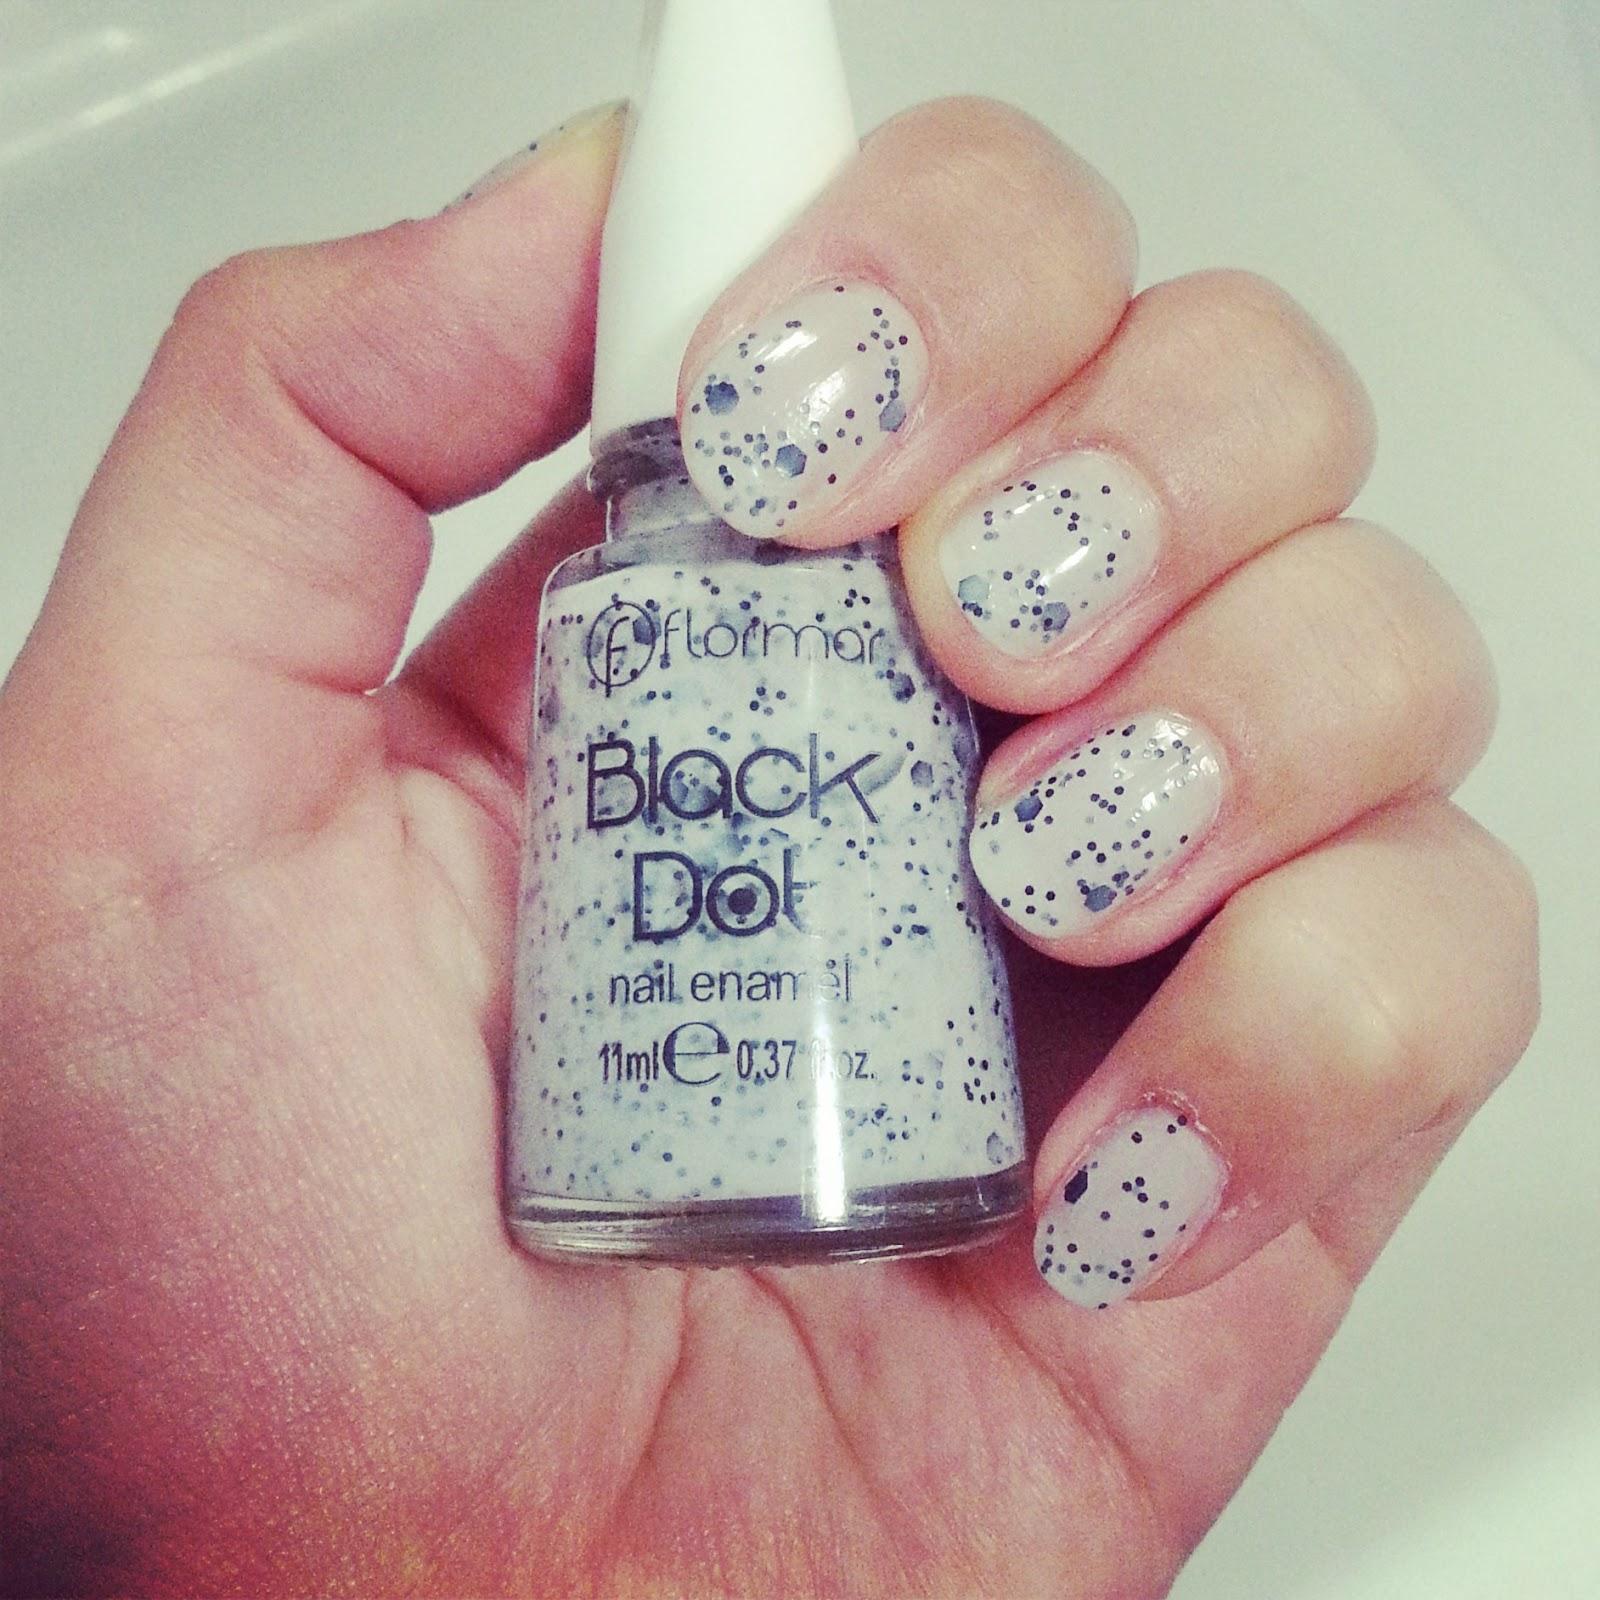 Flormar Black Dots Nail Enamel